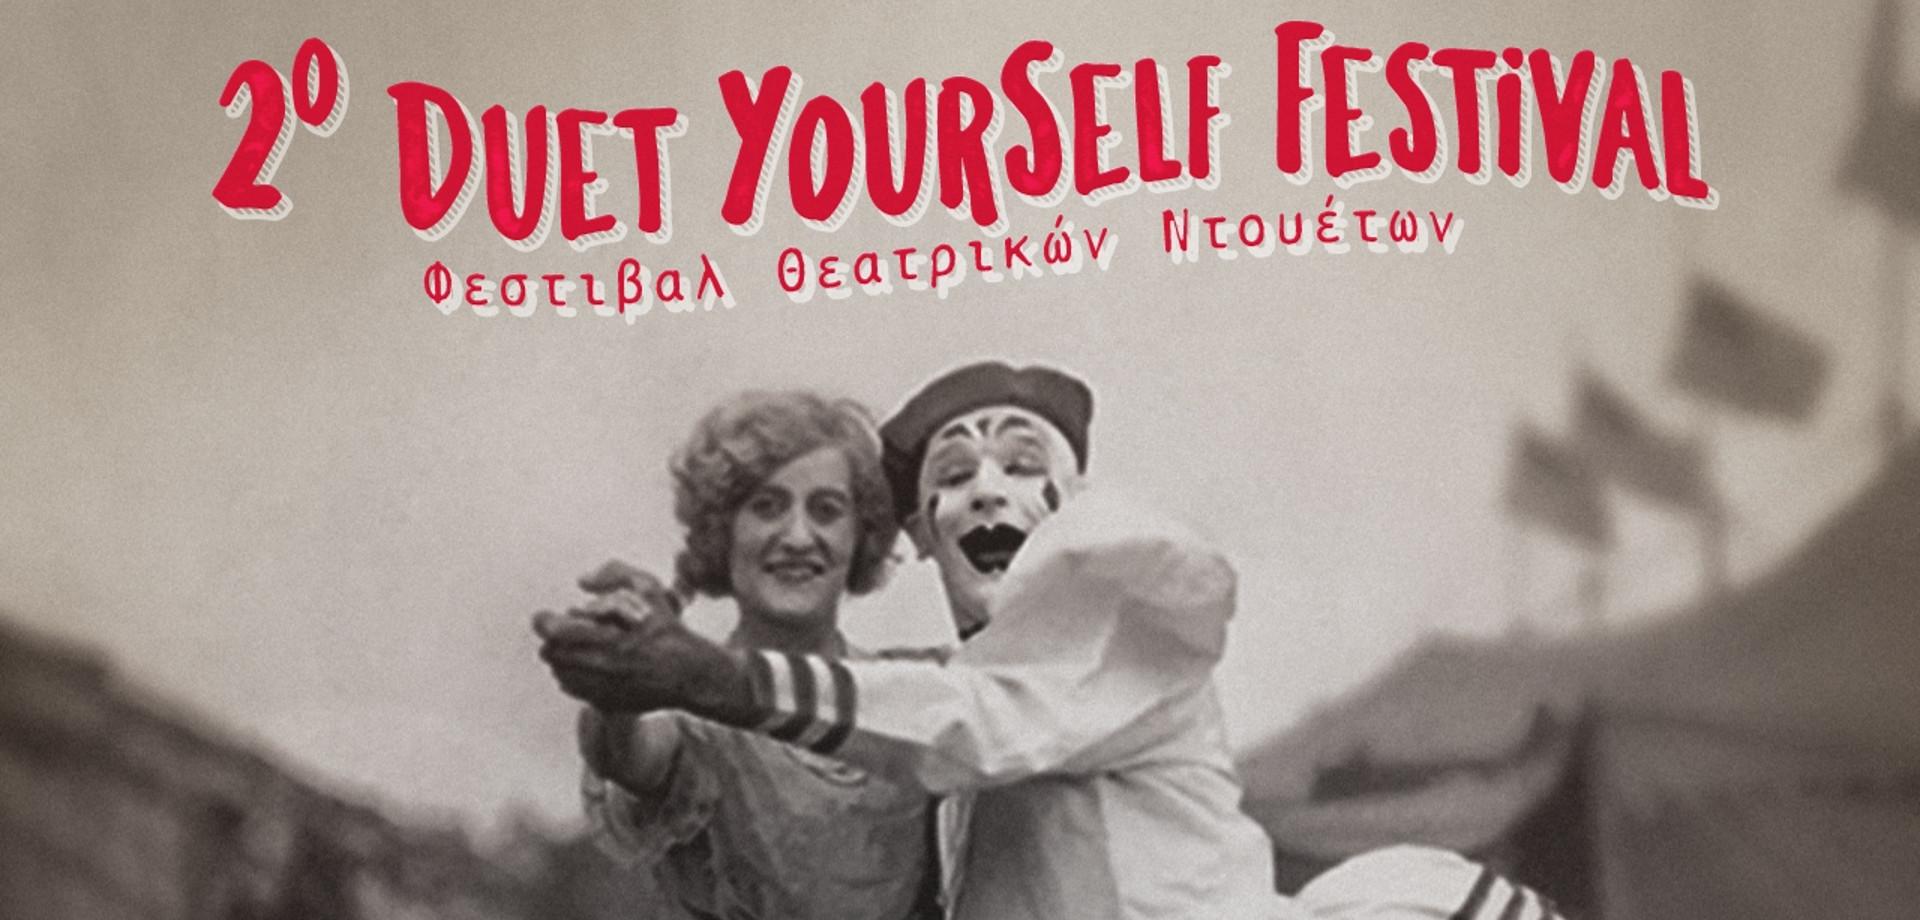 2o Duet yourself festival